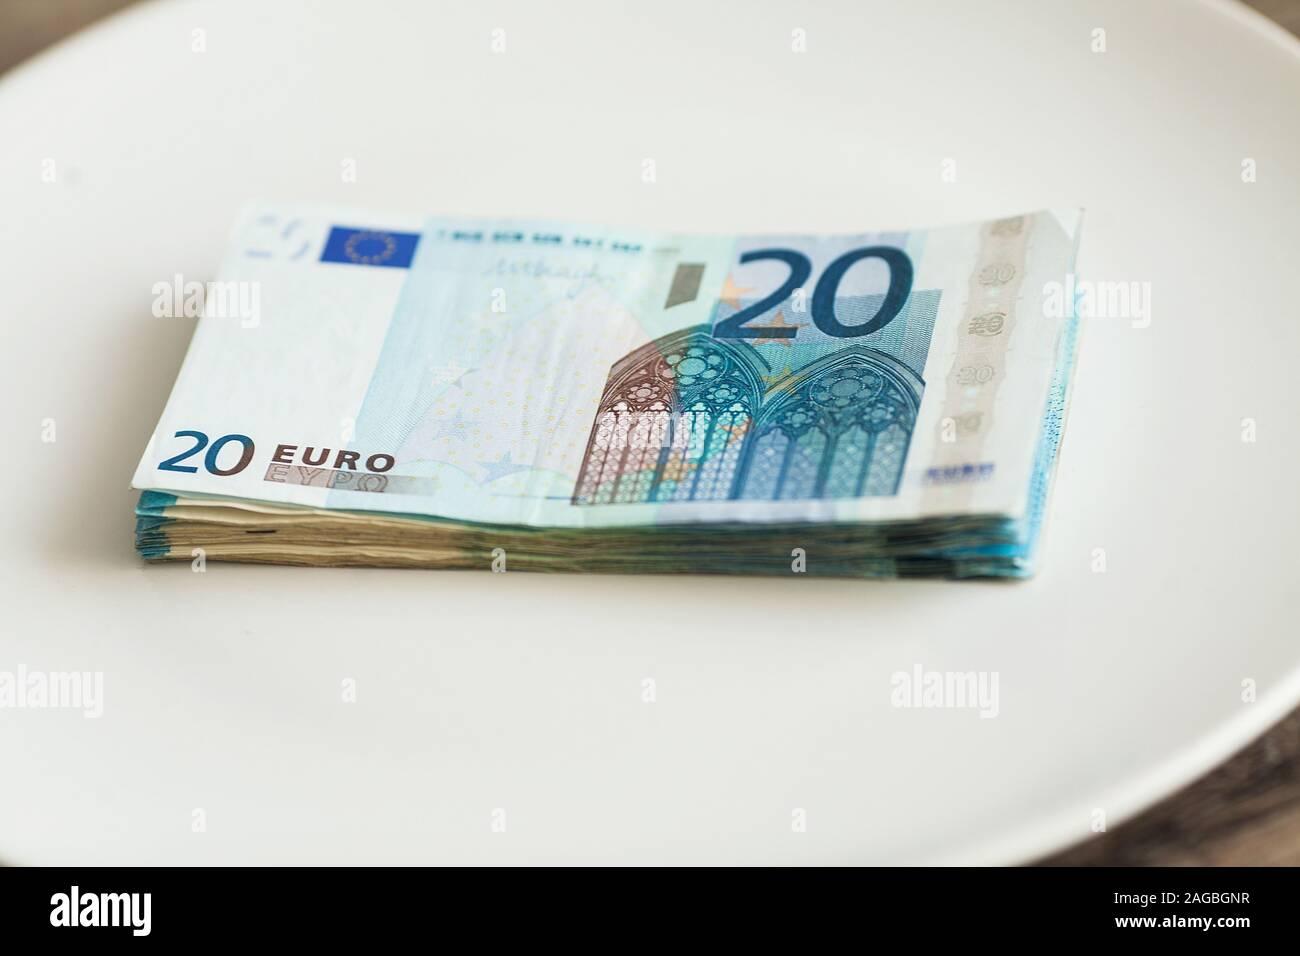 Money lying on the plate. Euros photo. Greedy corruption concept. Bribe idea. Stock Photo